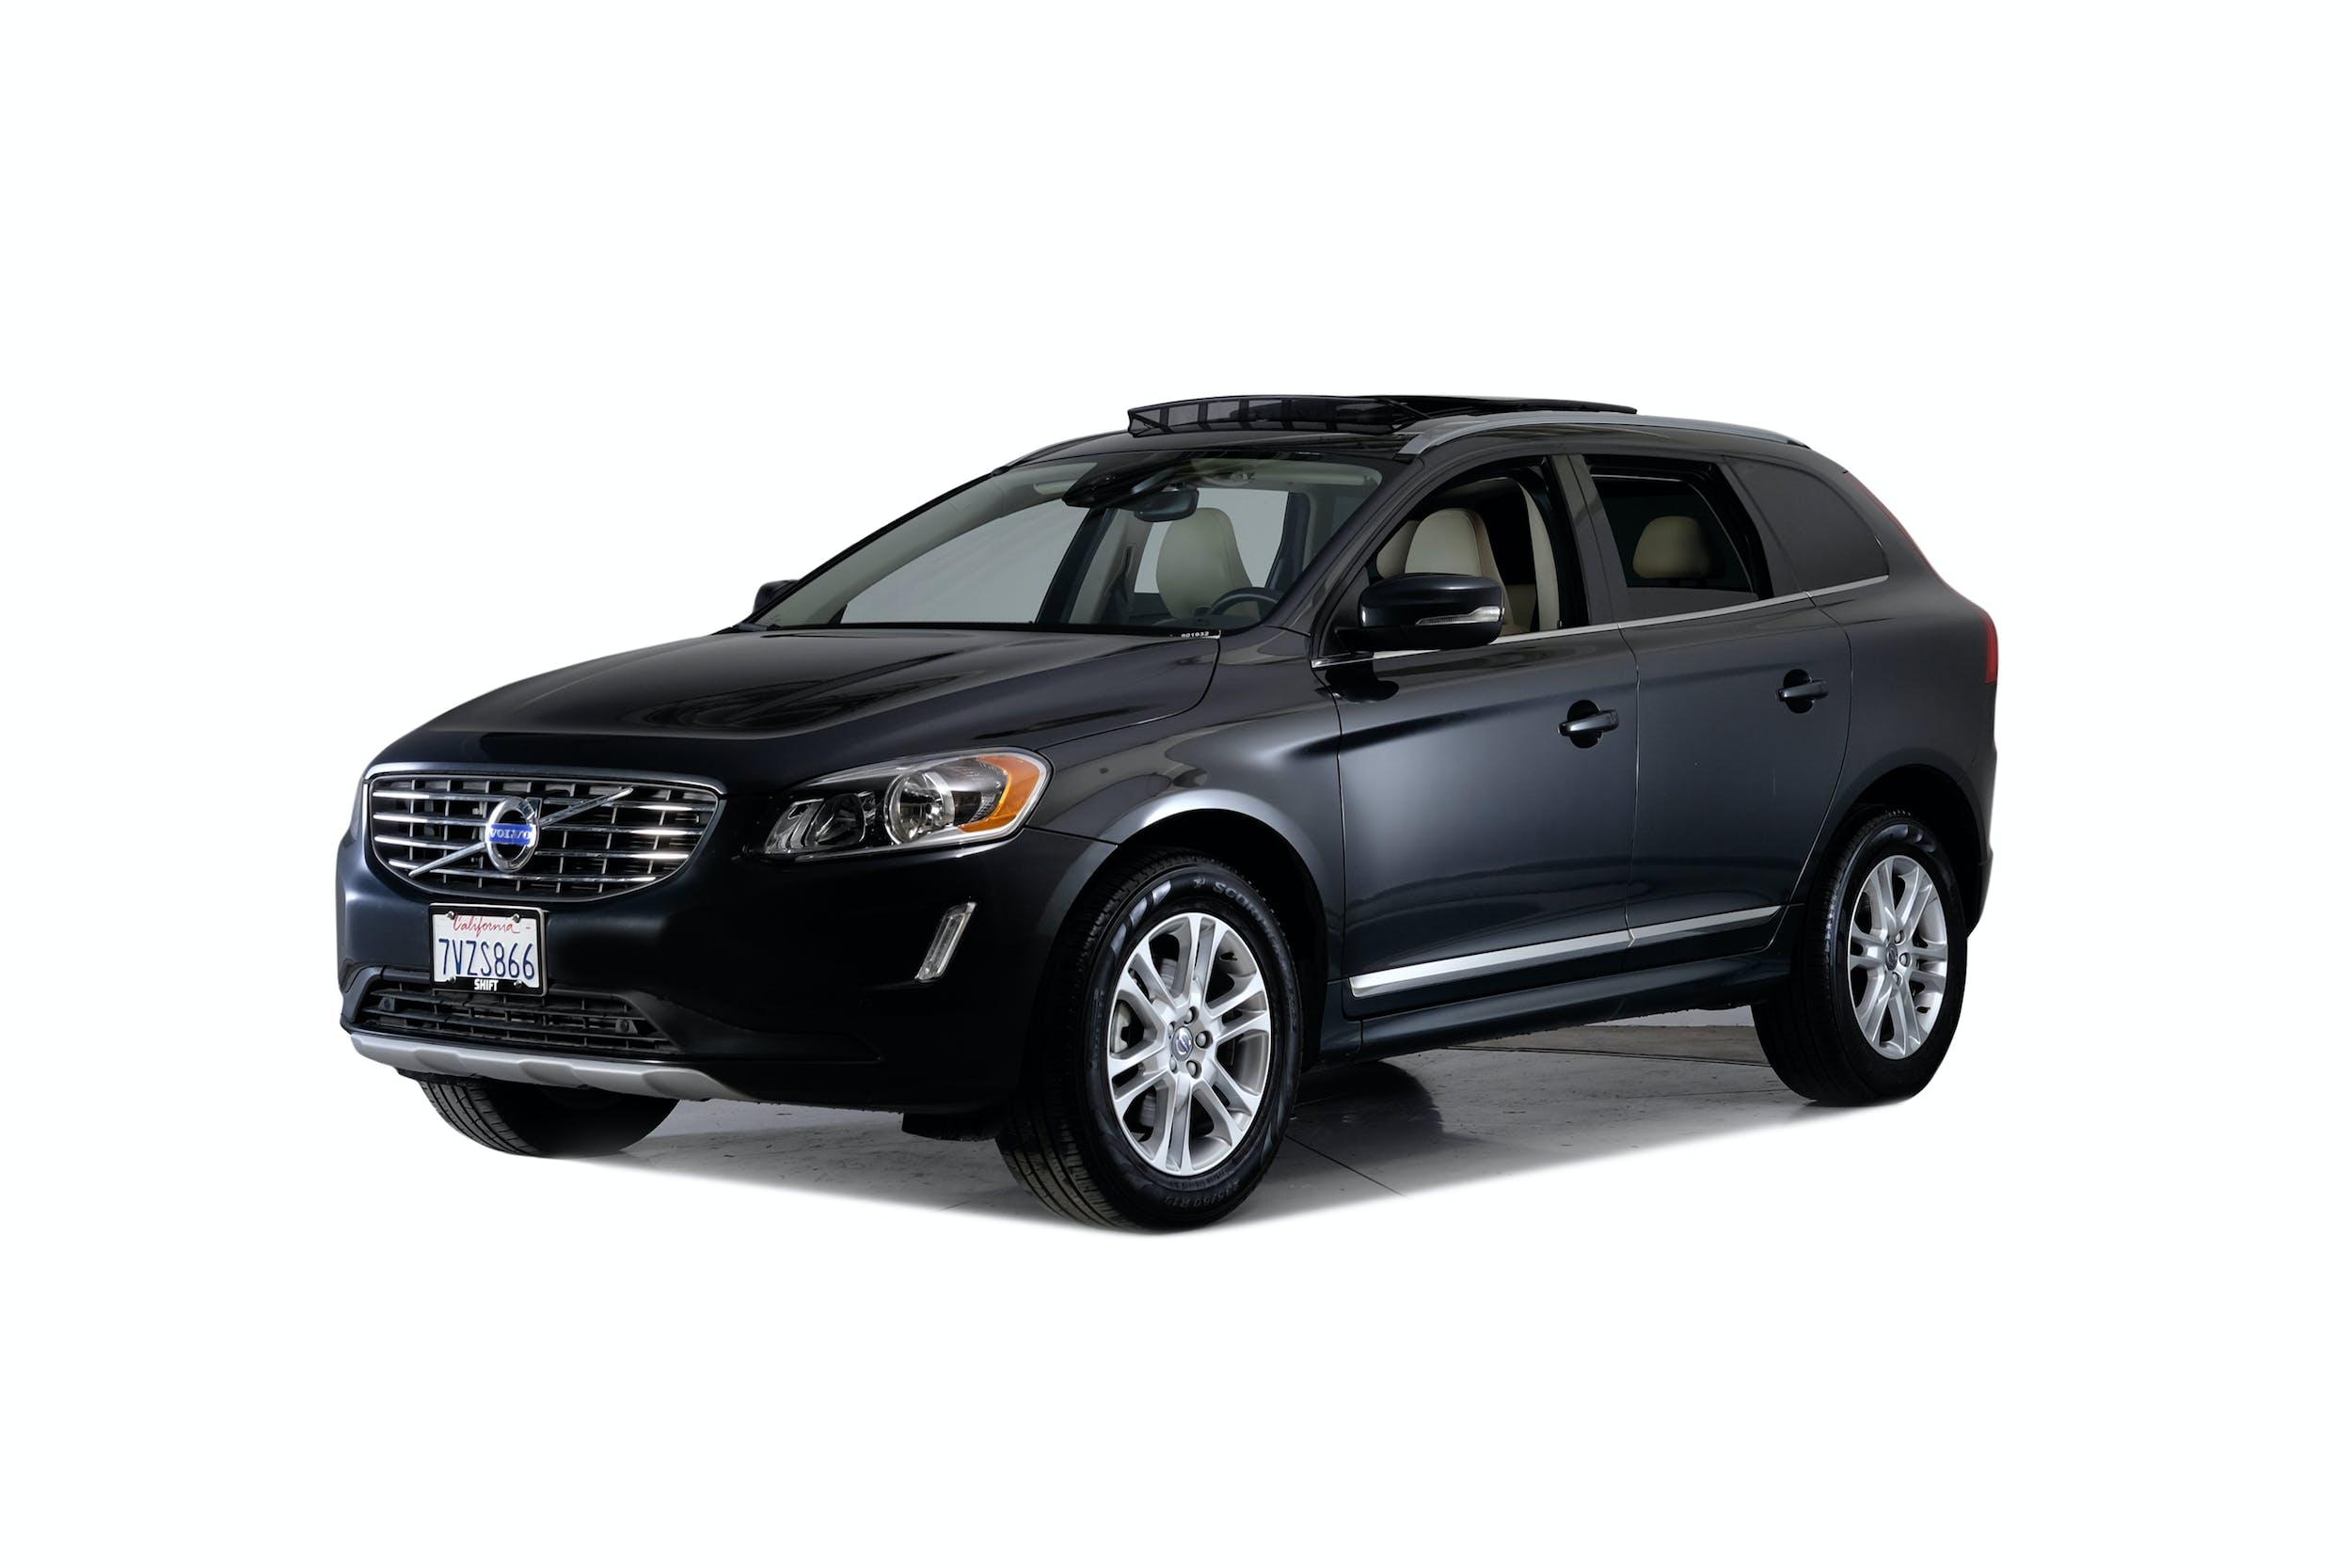 Used Volvo for sale in San Francisco | Shift